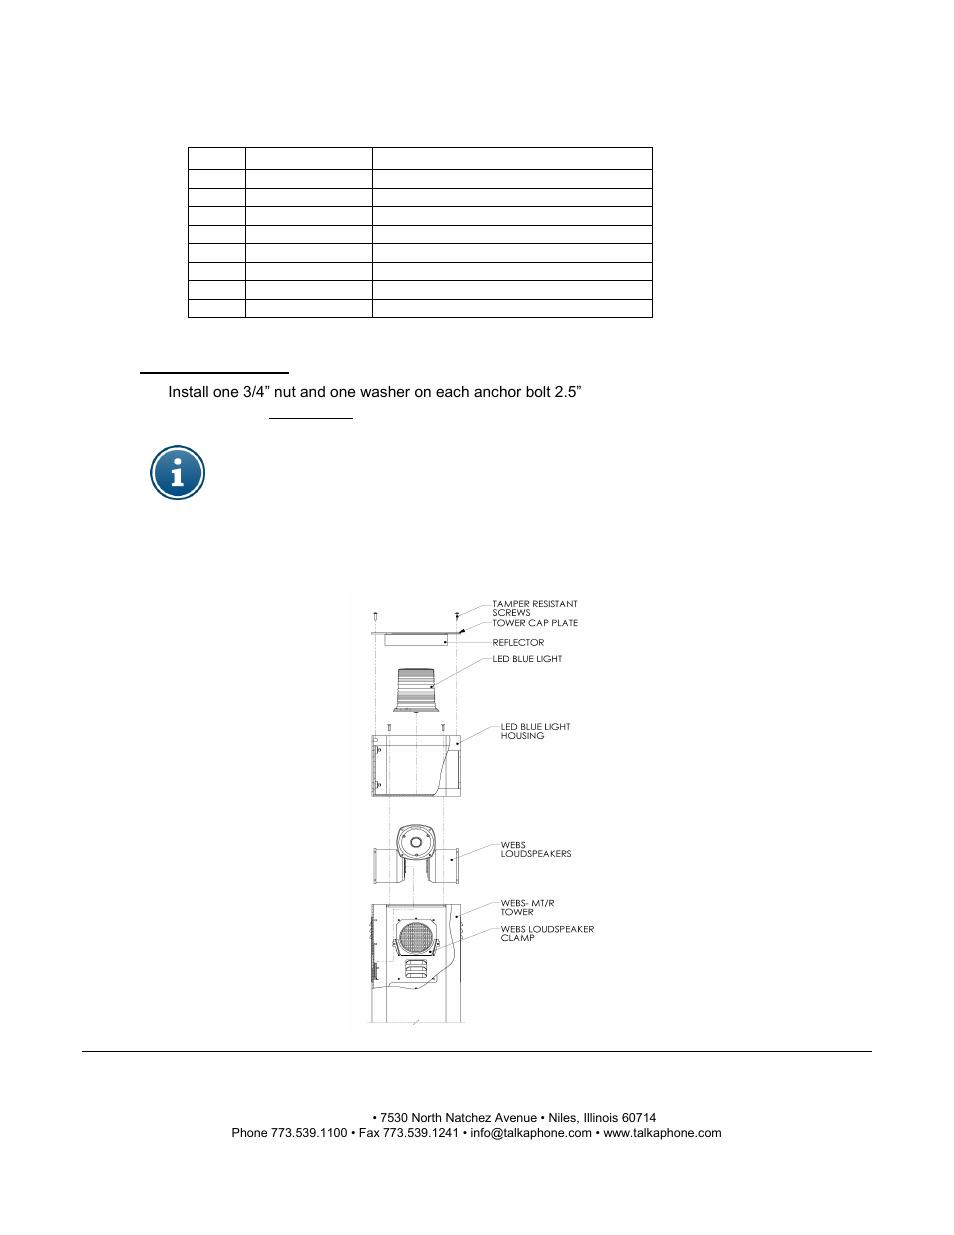 Webs-mt/r tower installation instructions | Talkaphone WEBS-MT/R-